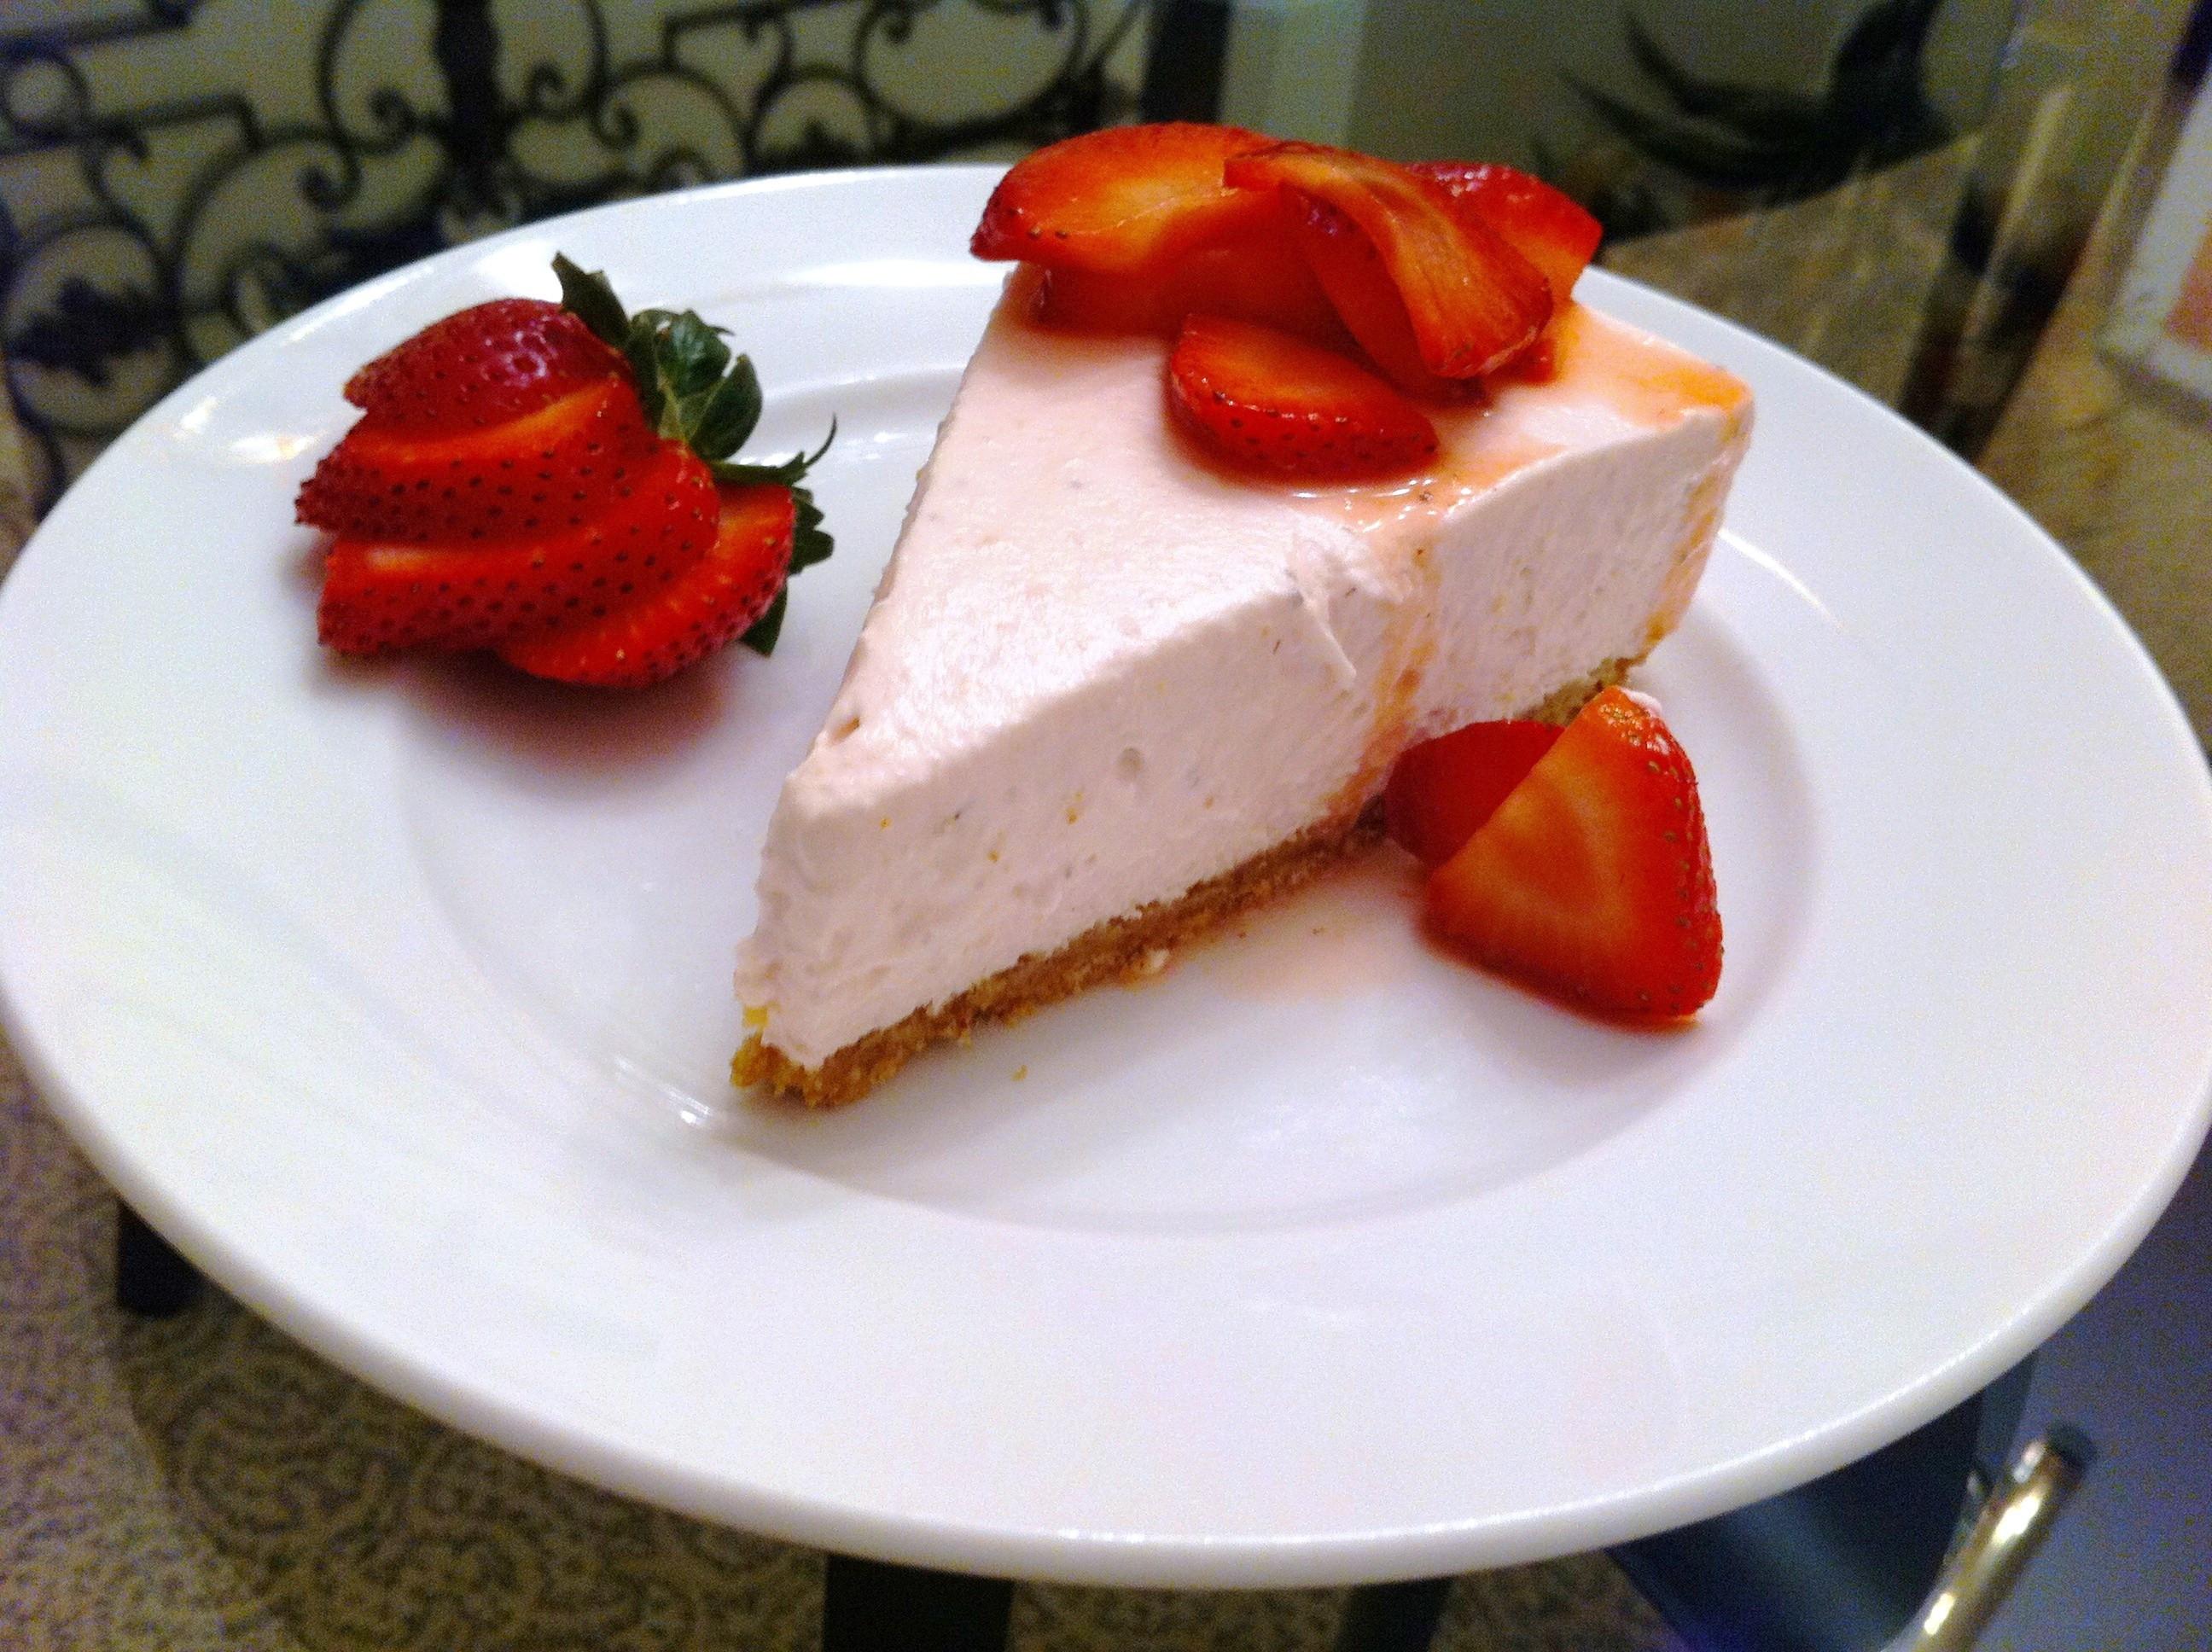 Cheesecake Recipe No Bake  No Bake Strawberry Cheese Cake Andicakes